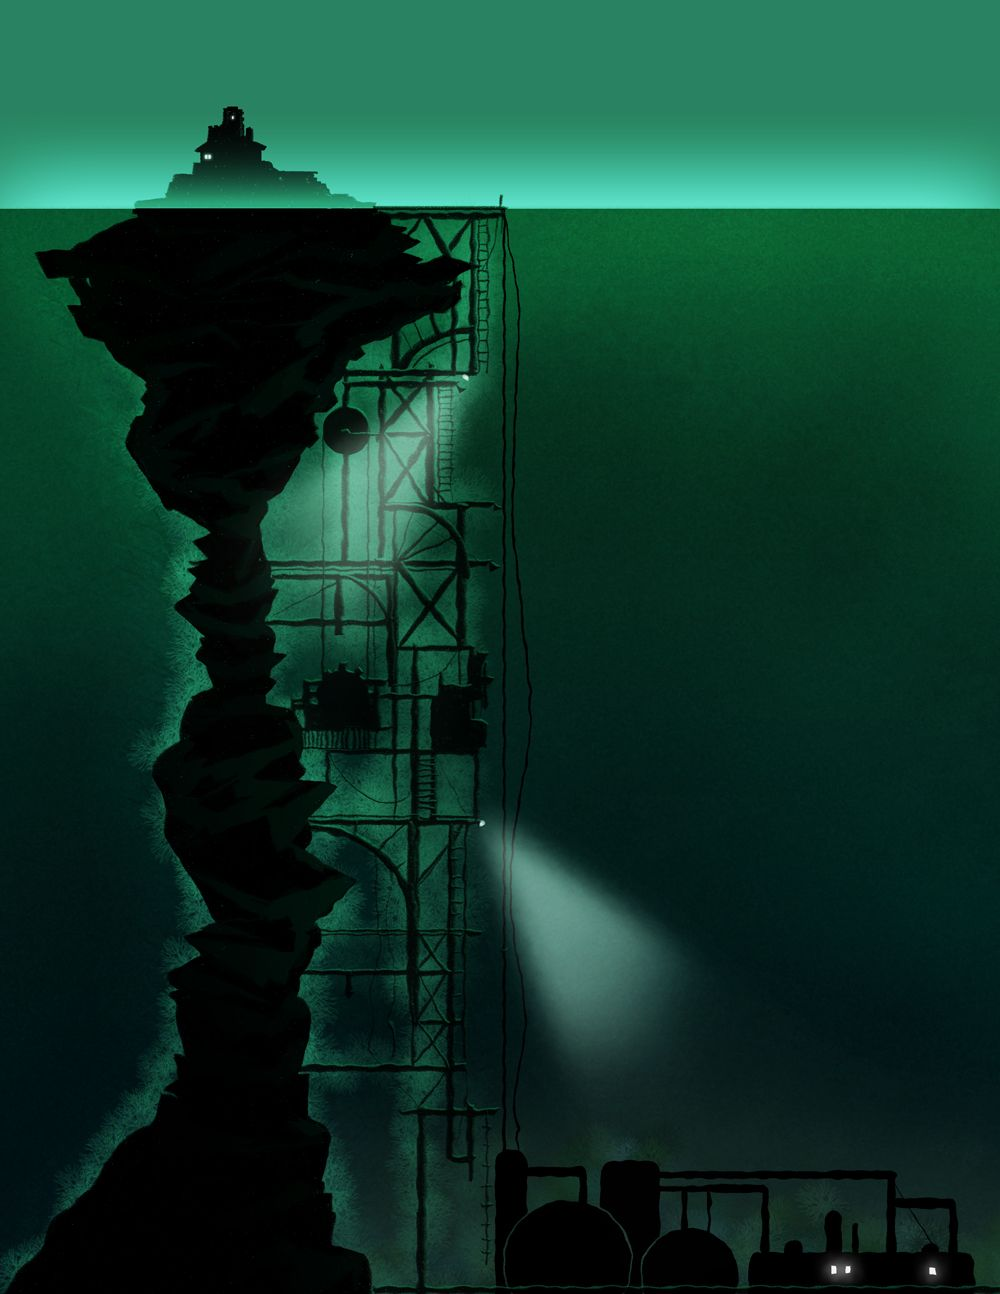 paul arendt : Photo Sunless Sea #sunlesssea #failbettergames | Geeky